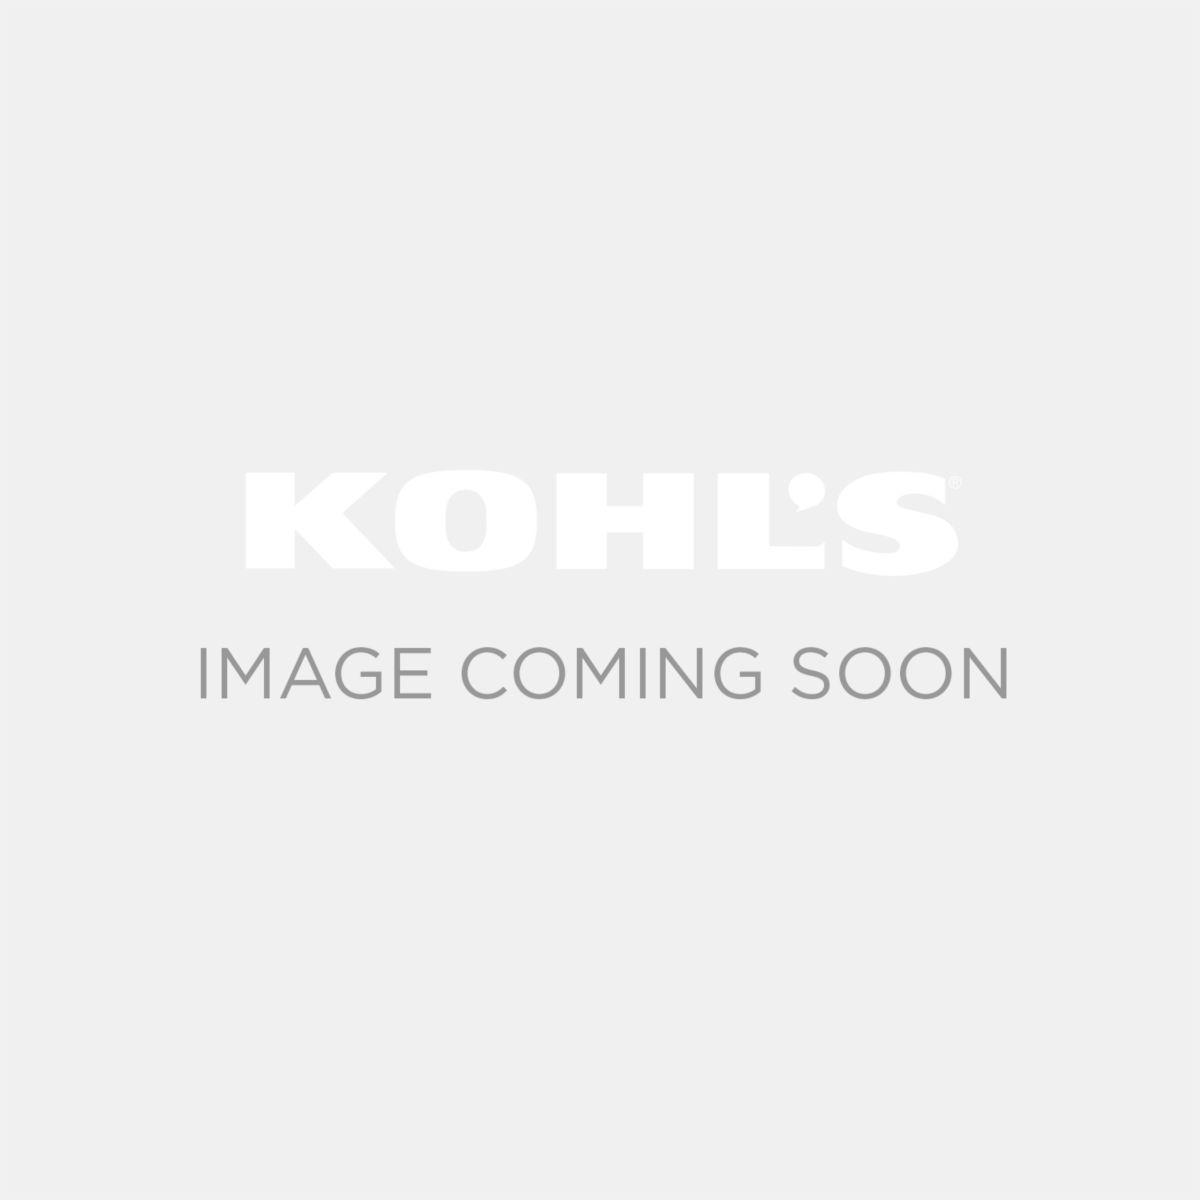 Akademiks Roger Men's Loafers Tan 7t1JI